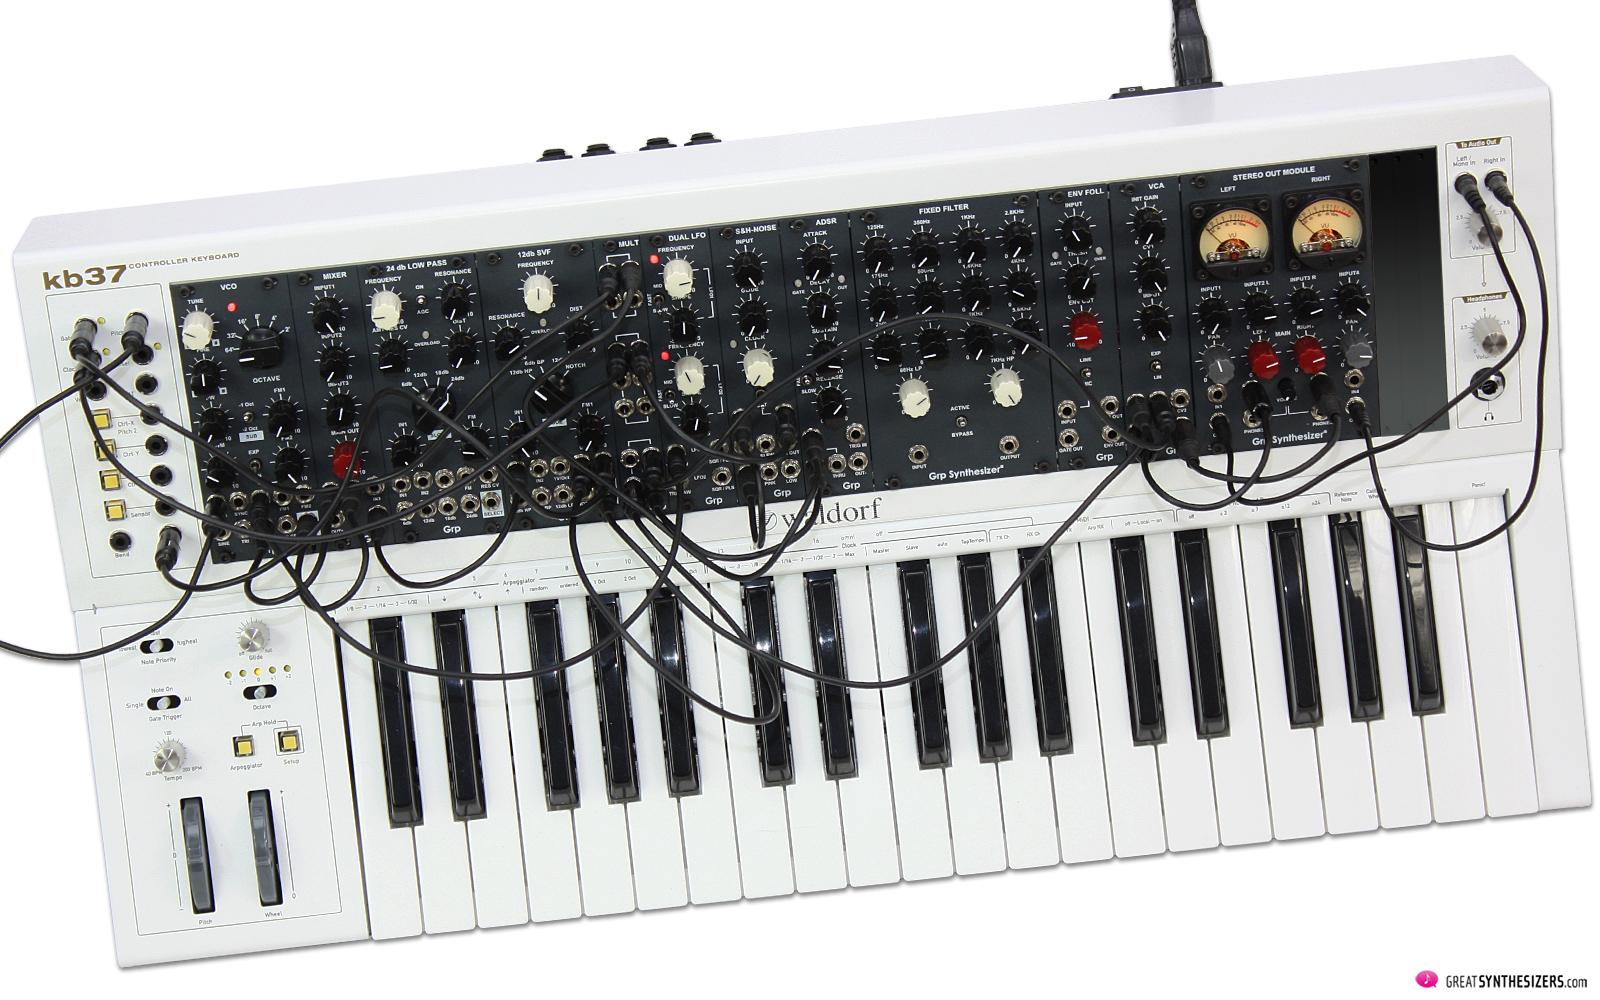 GRP Eurorack Synthesizer Modules - Waldorf kb37